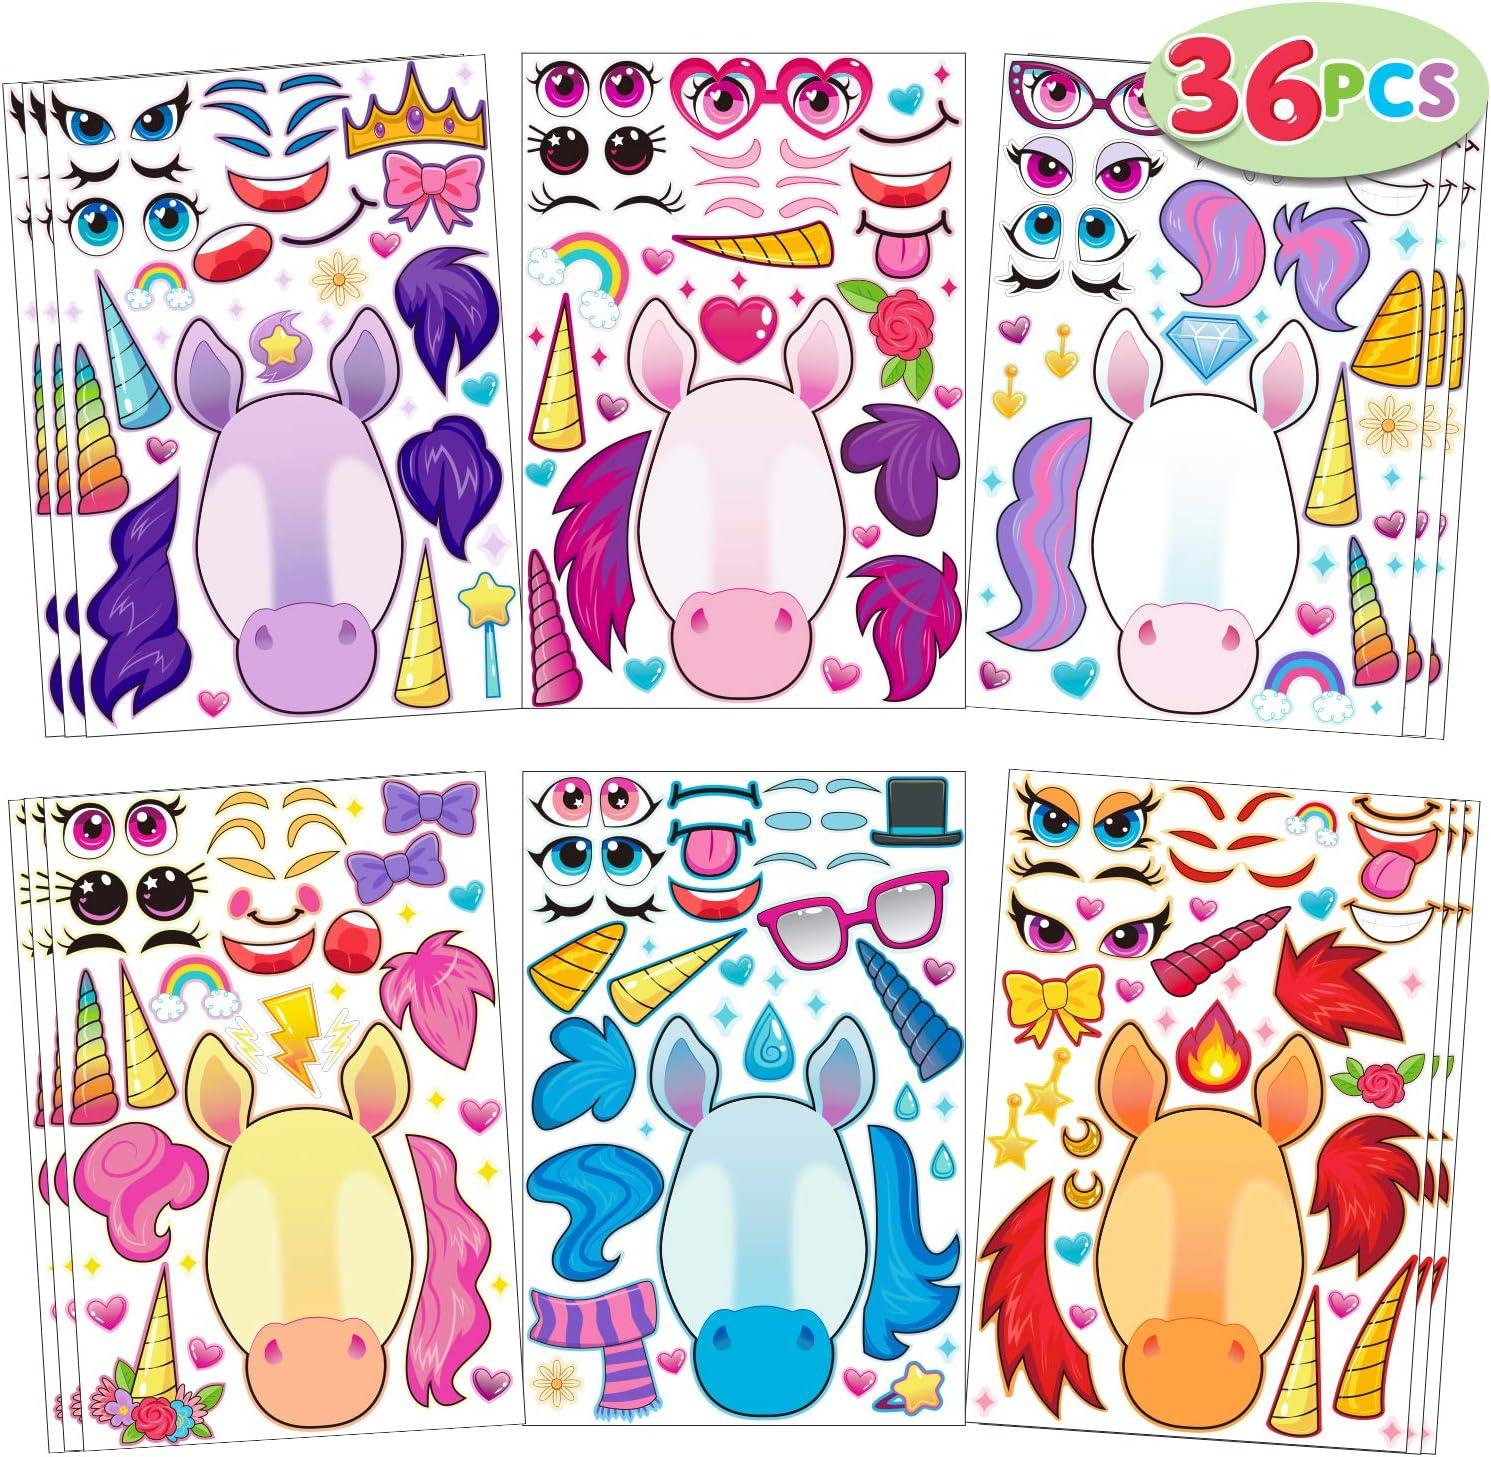 JOYIN 36 PCS Make-a-face Sticker Sheets Make Your Own Unicorn Fantasy Animal Mix and Match Sticker Sheets with Fantasy Unicorn Animals Kids Party Favor Supplies Craft